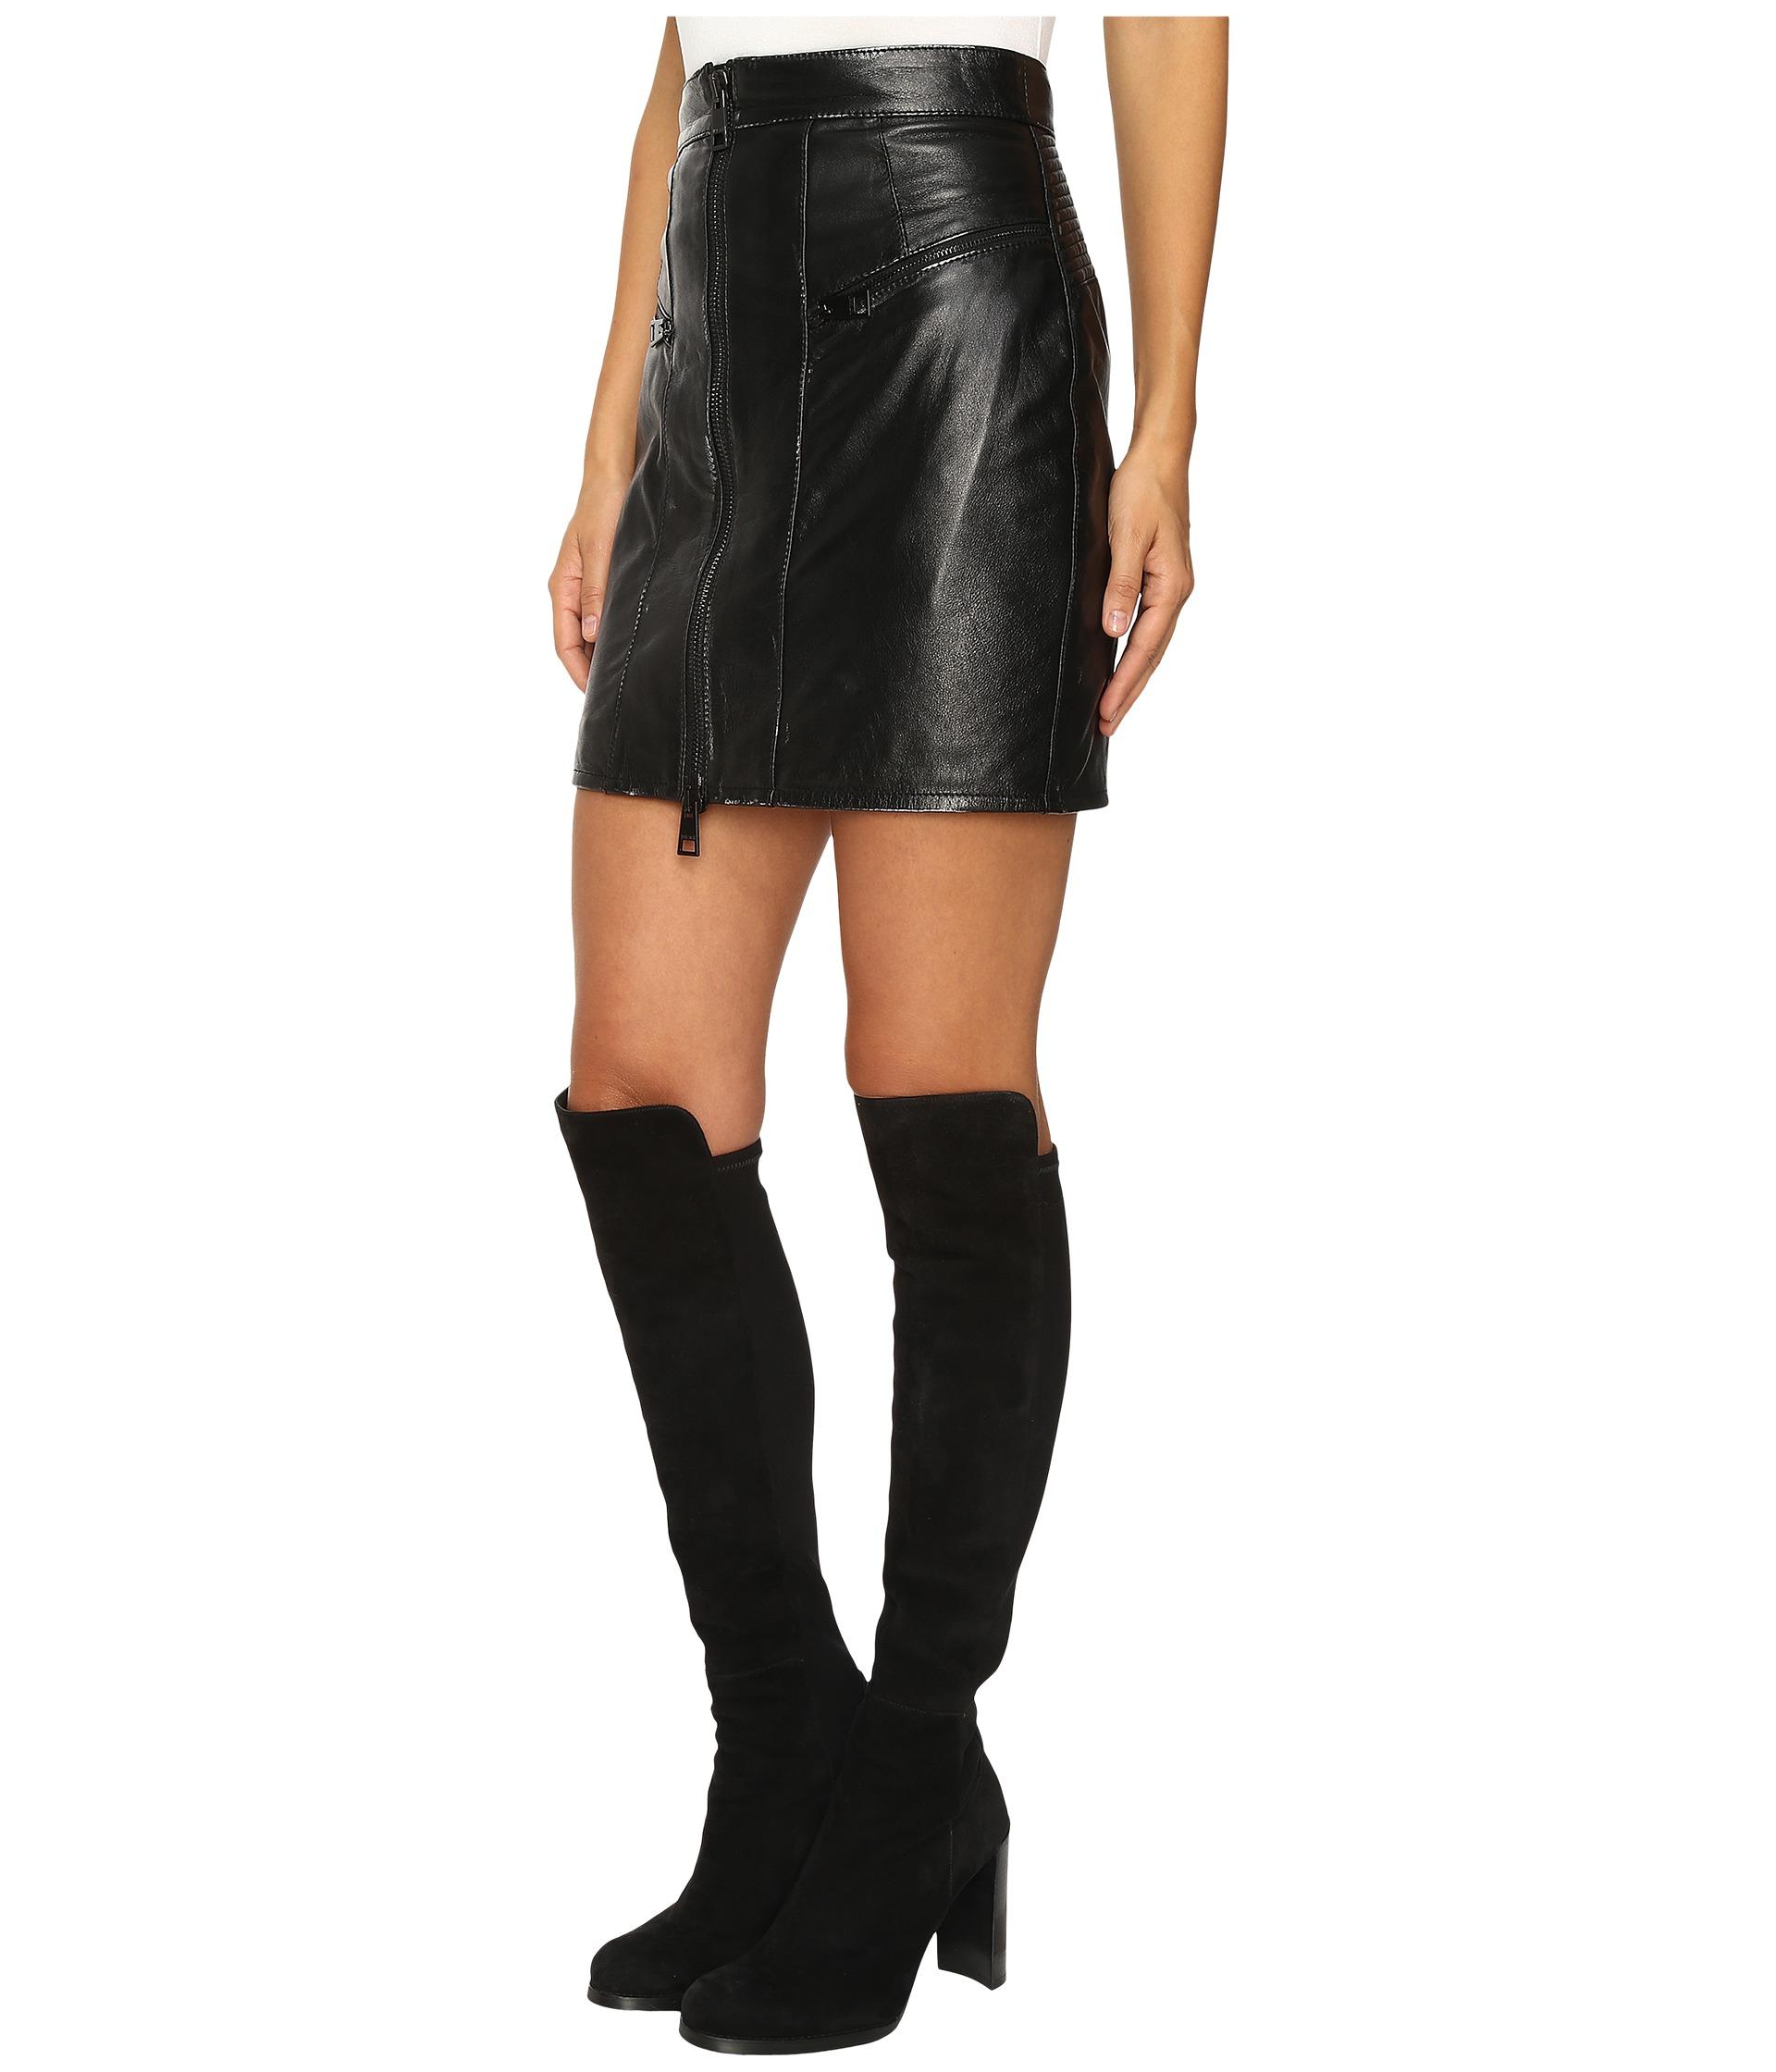 Just Cavalli Leather Mini Skirt w/ Metallic Finish Black ...